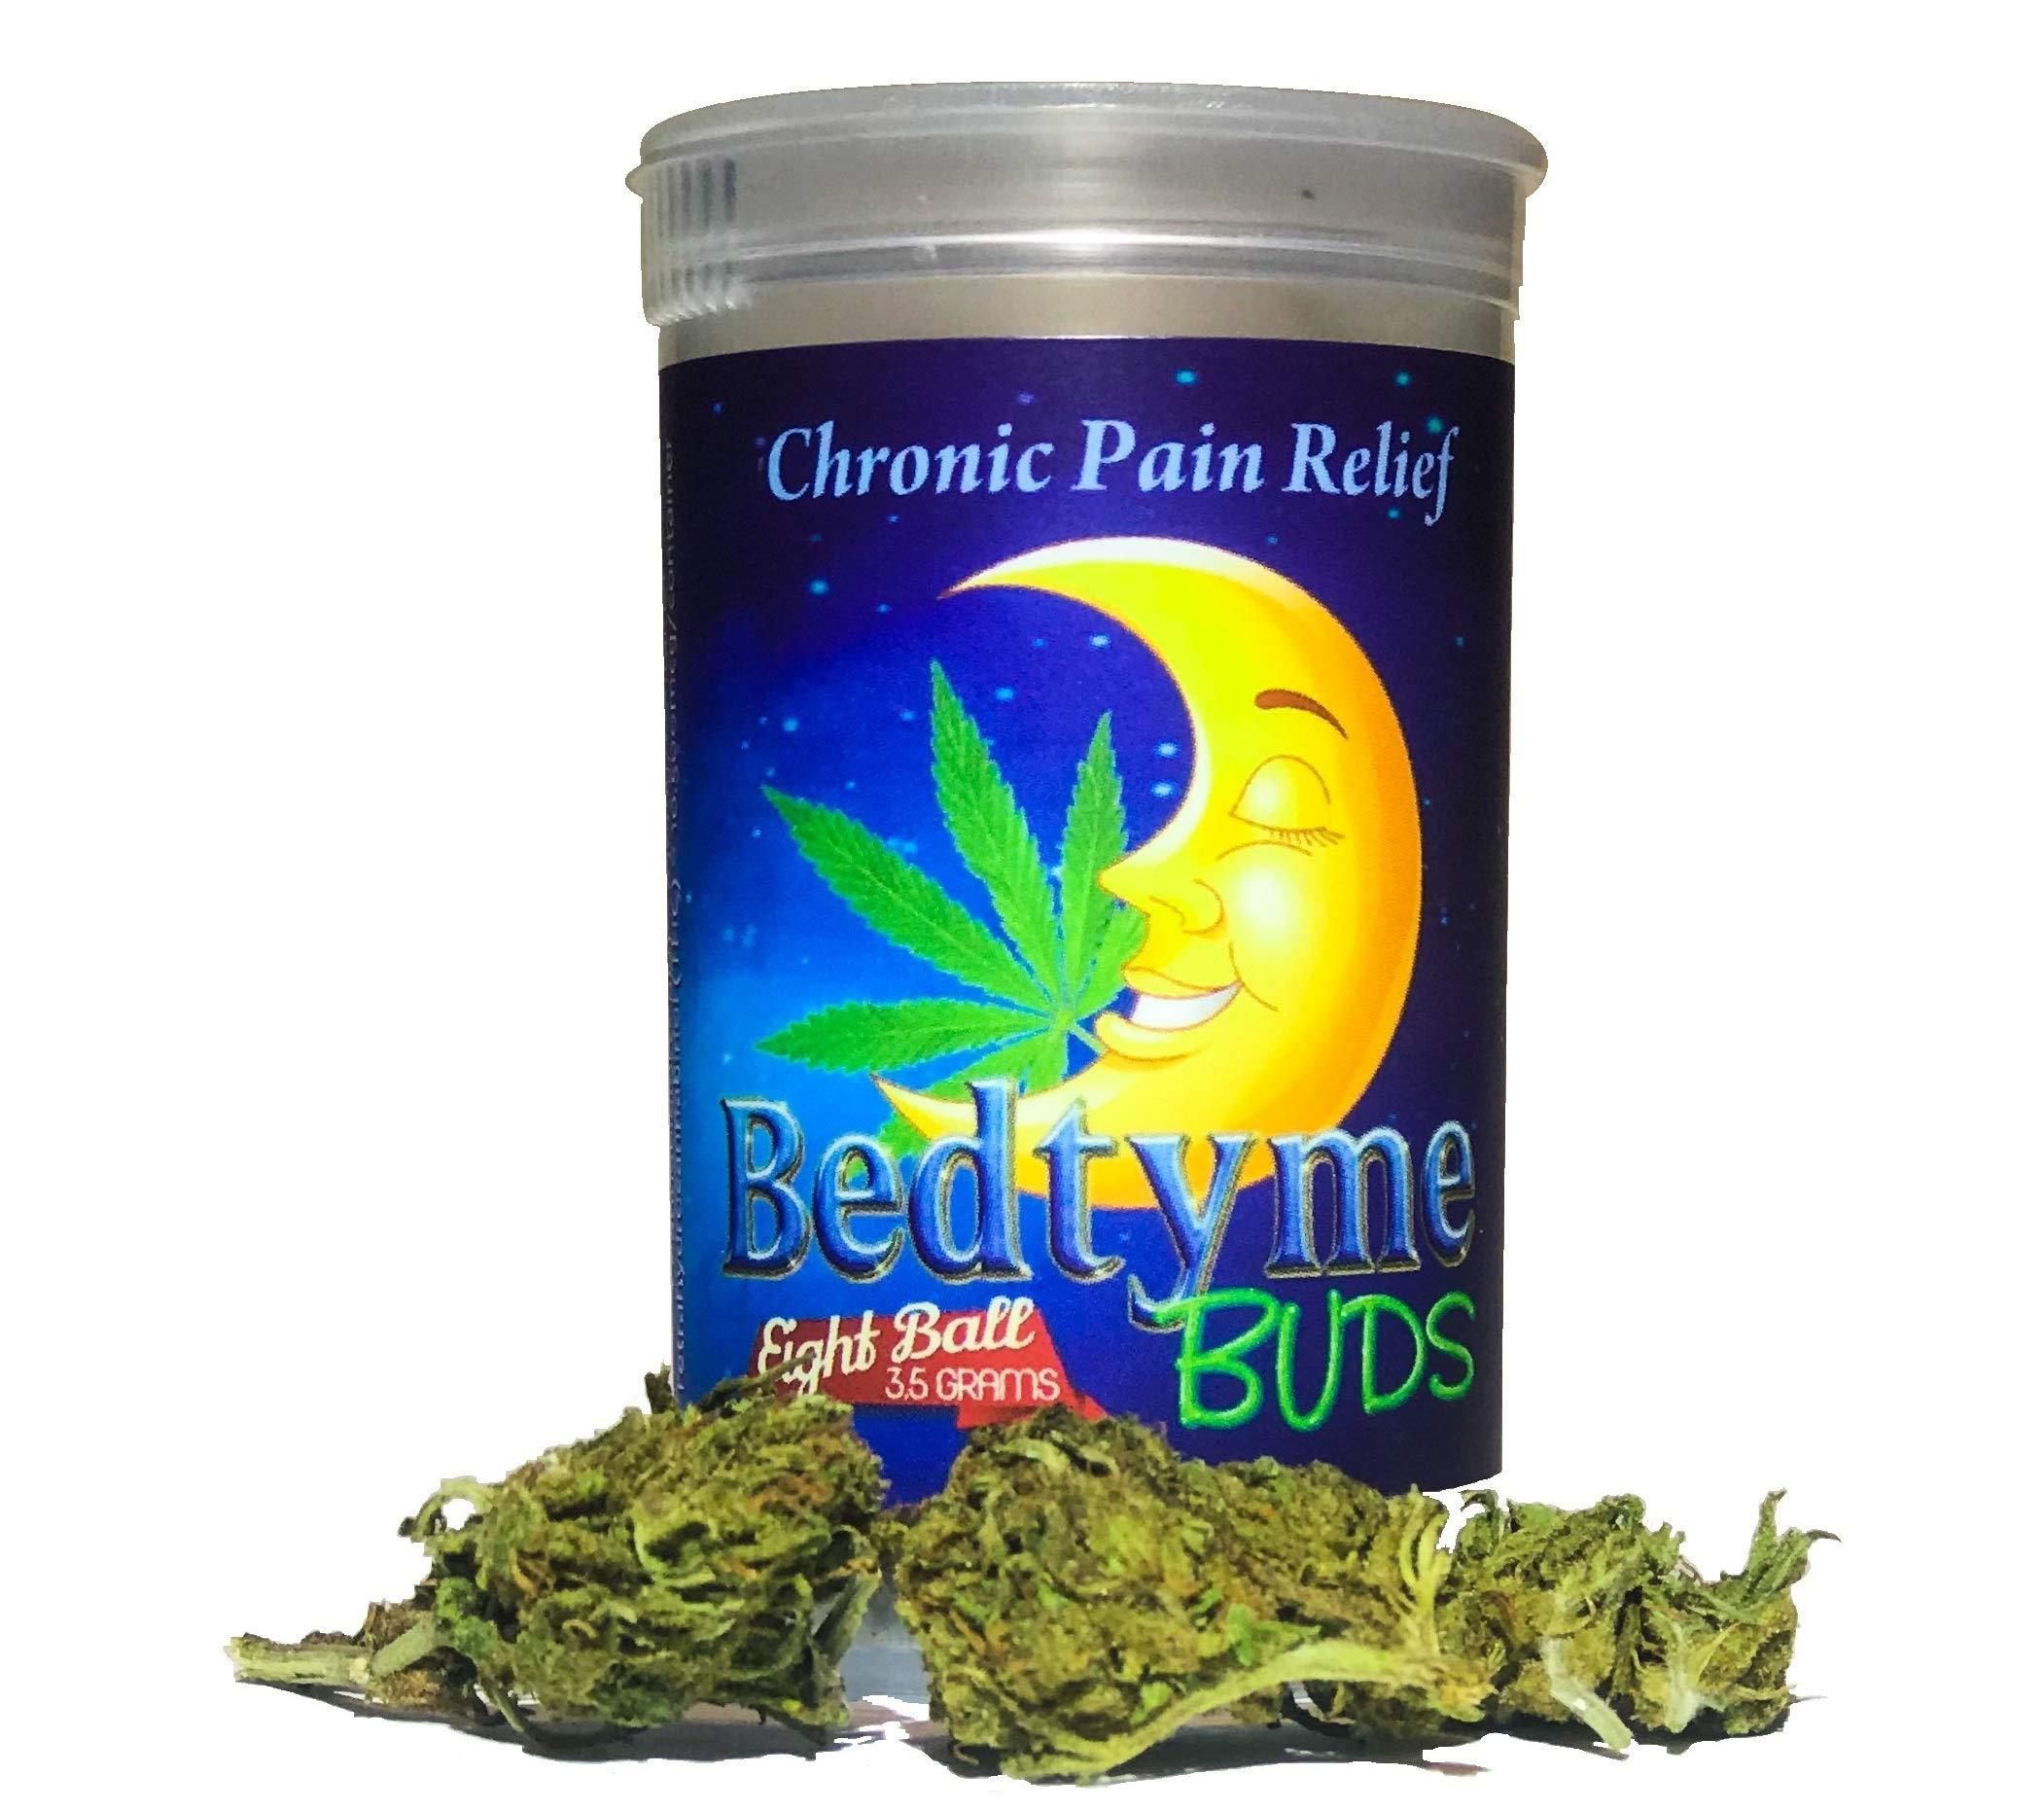 BedtymeBUDS CBDhempFlower 3.5 grams Chronic Pain Stress Relief